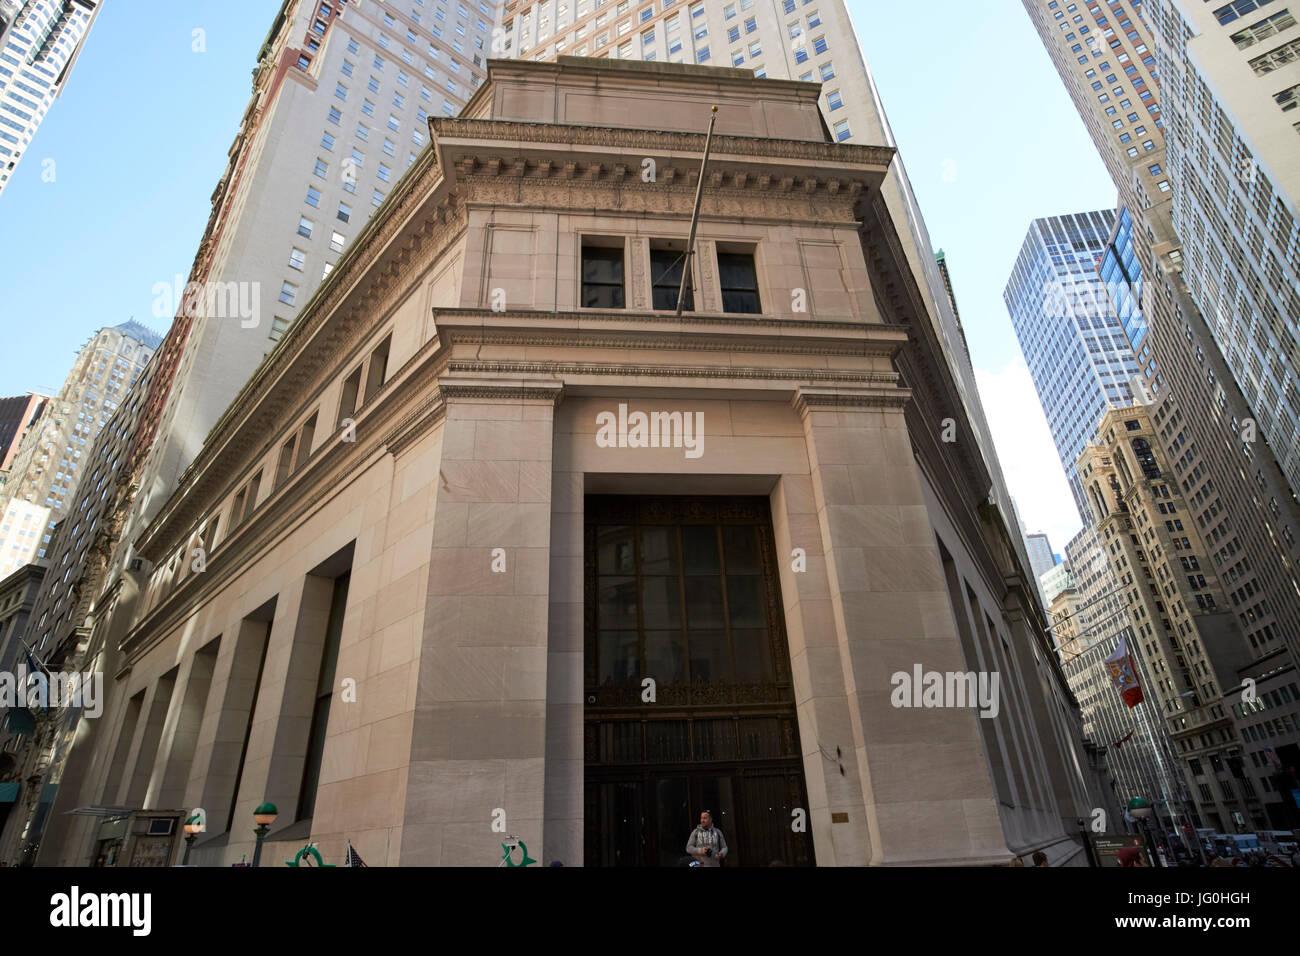 23 wall street New York City USA - Stock Image